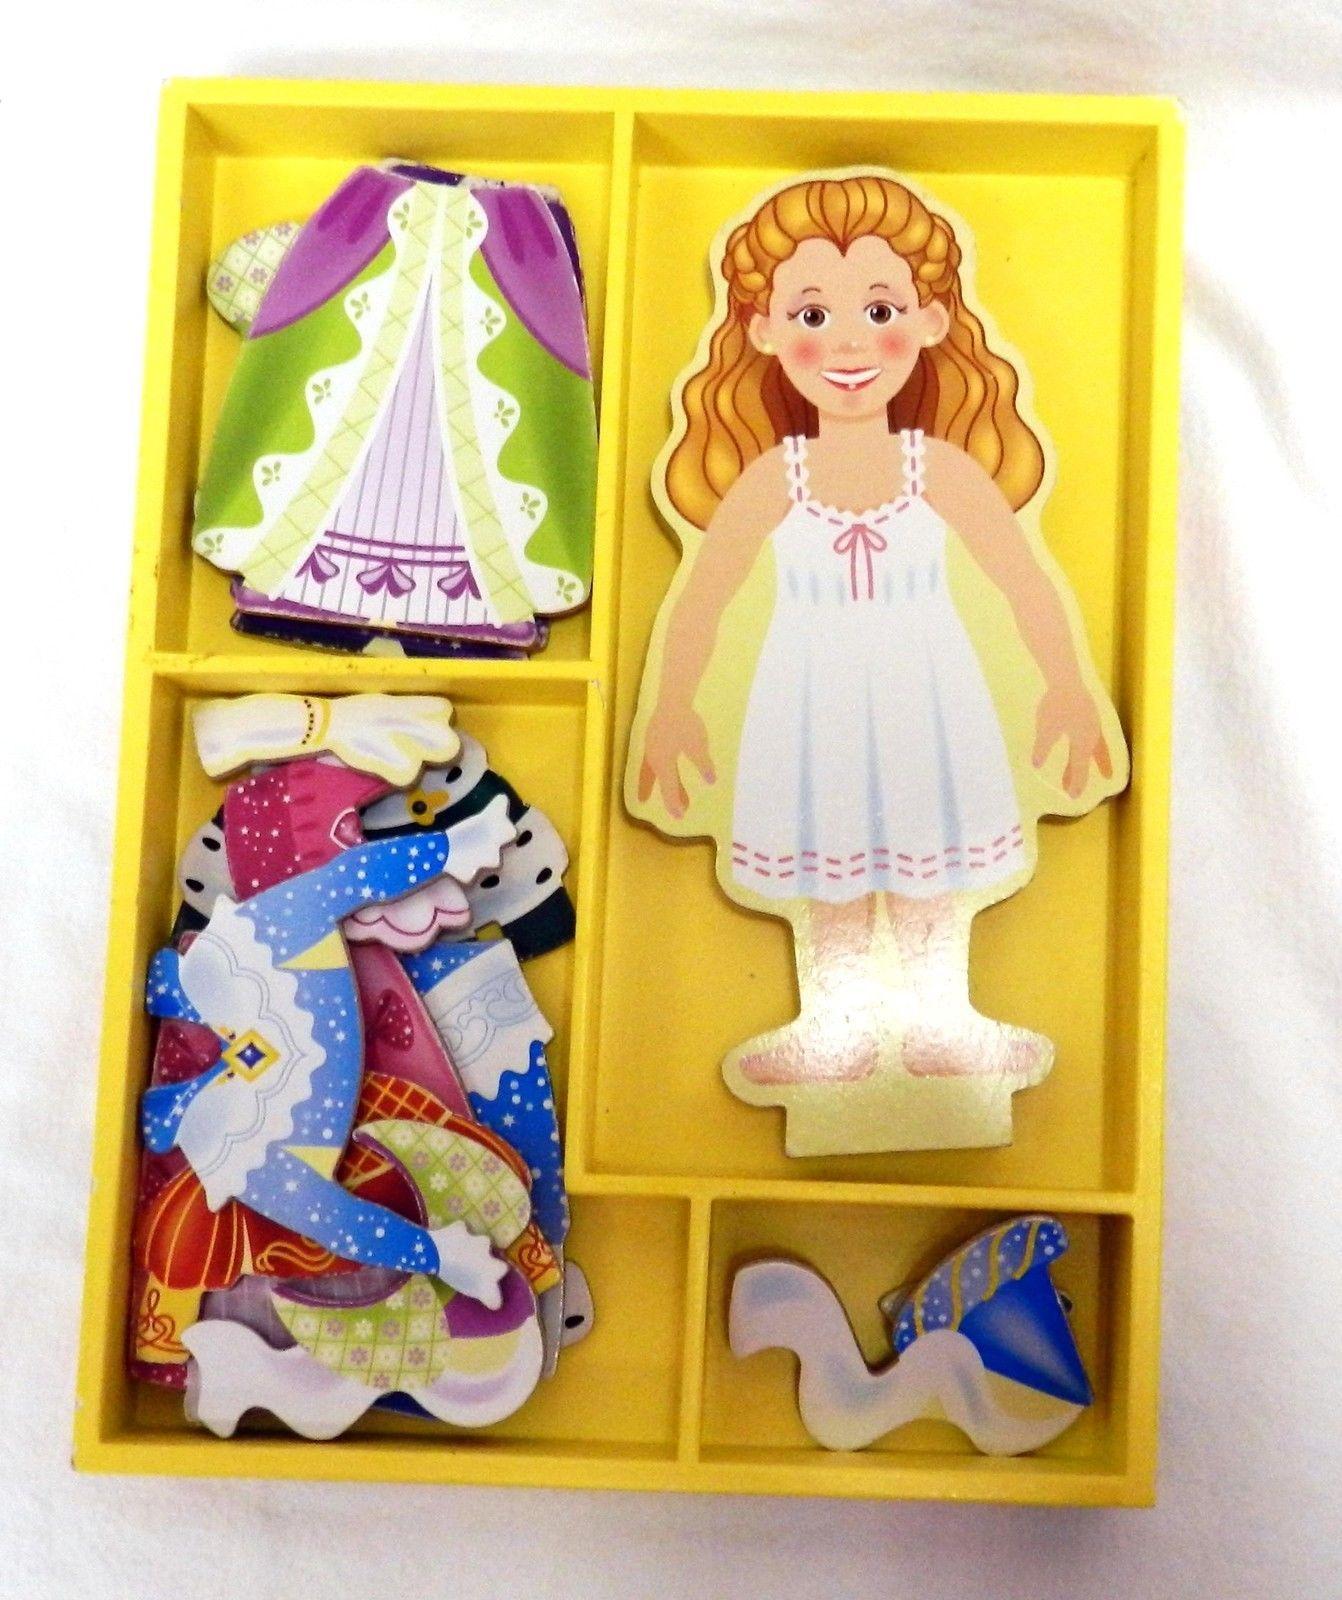 Melissa & Doug Magnetic Dress Up Princess Elise Wooden Clothing Doll Set - $17.43